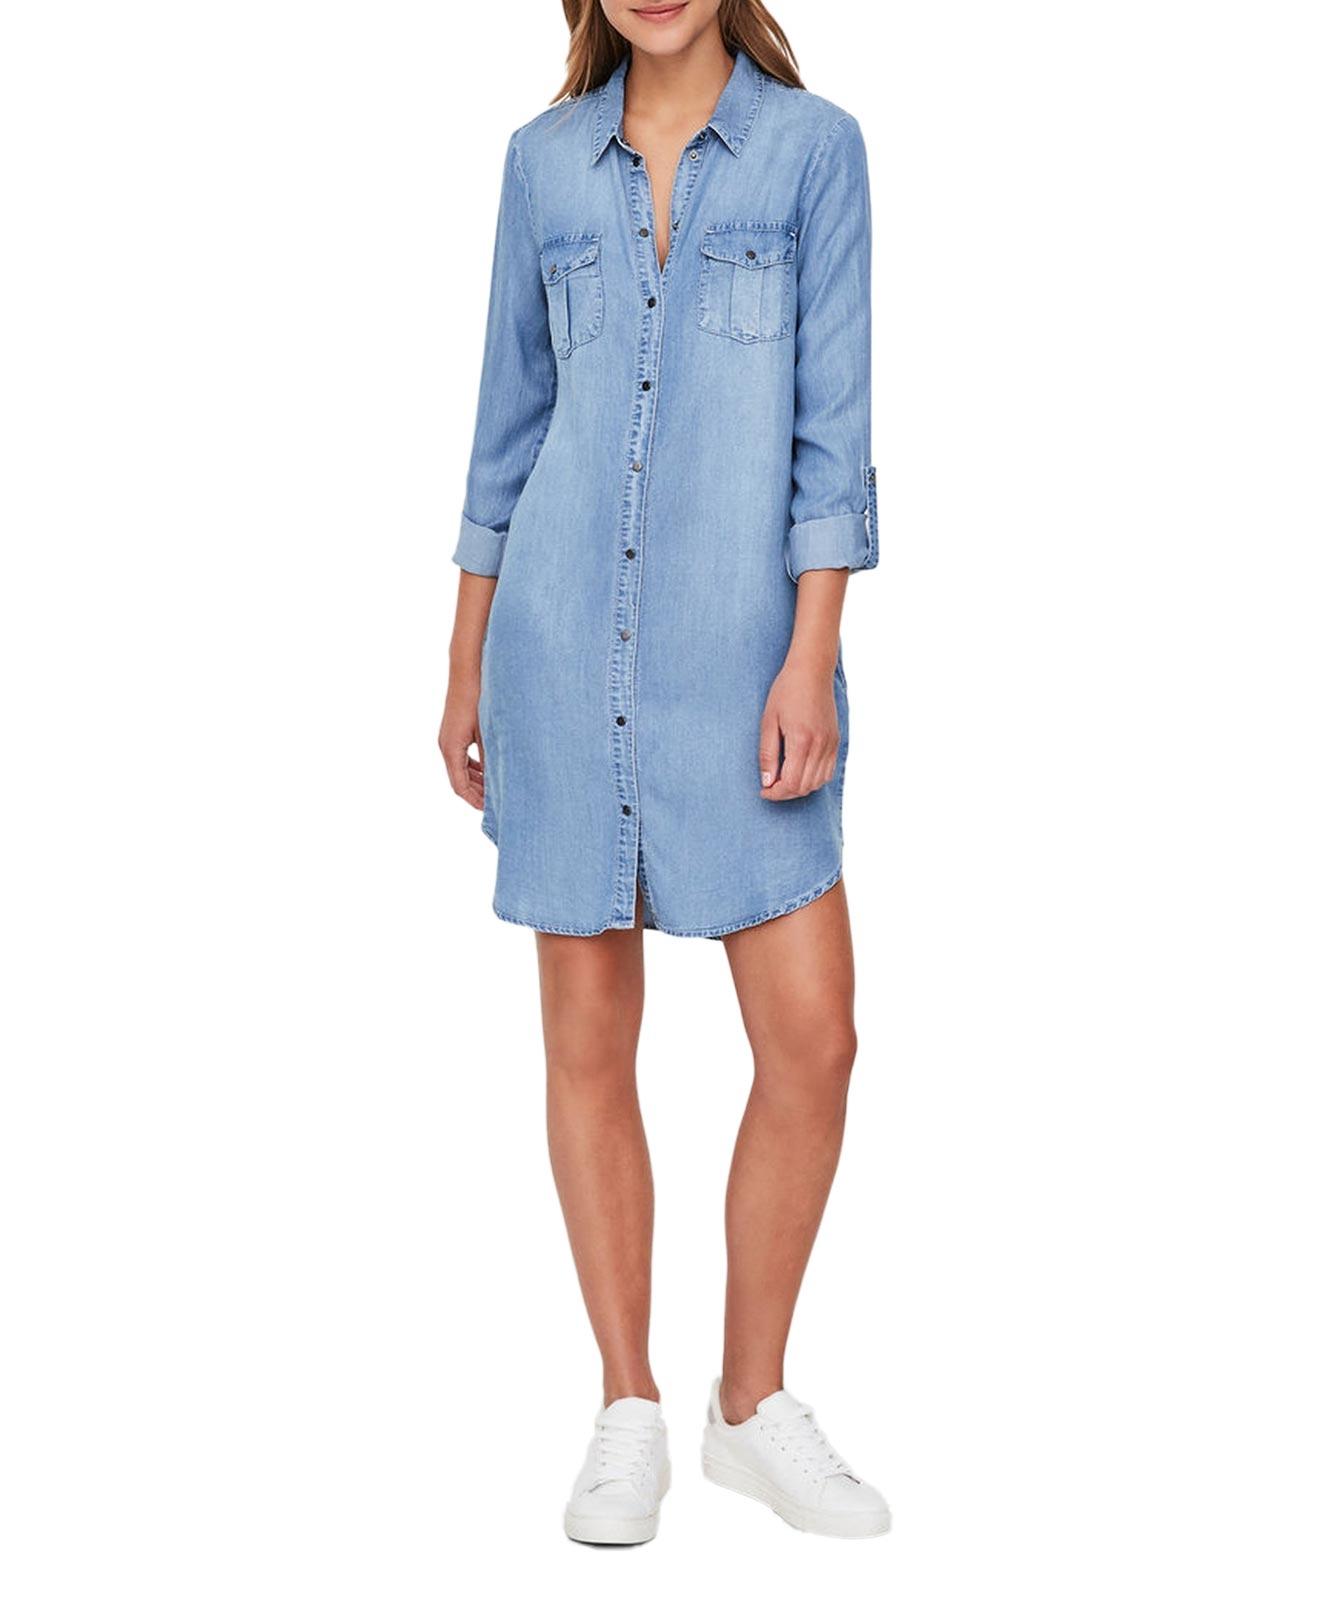 VERO MODA Silla - Shirt-Kleid - Light Blue Denim-M